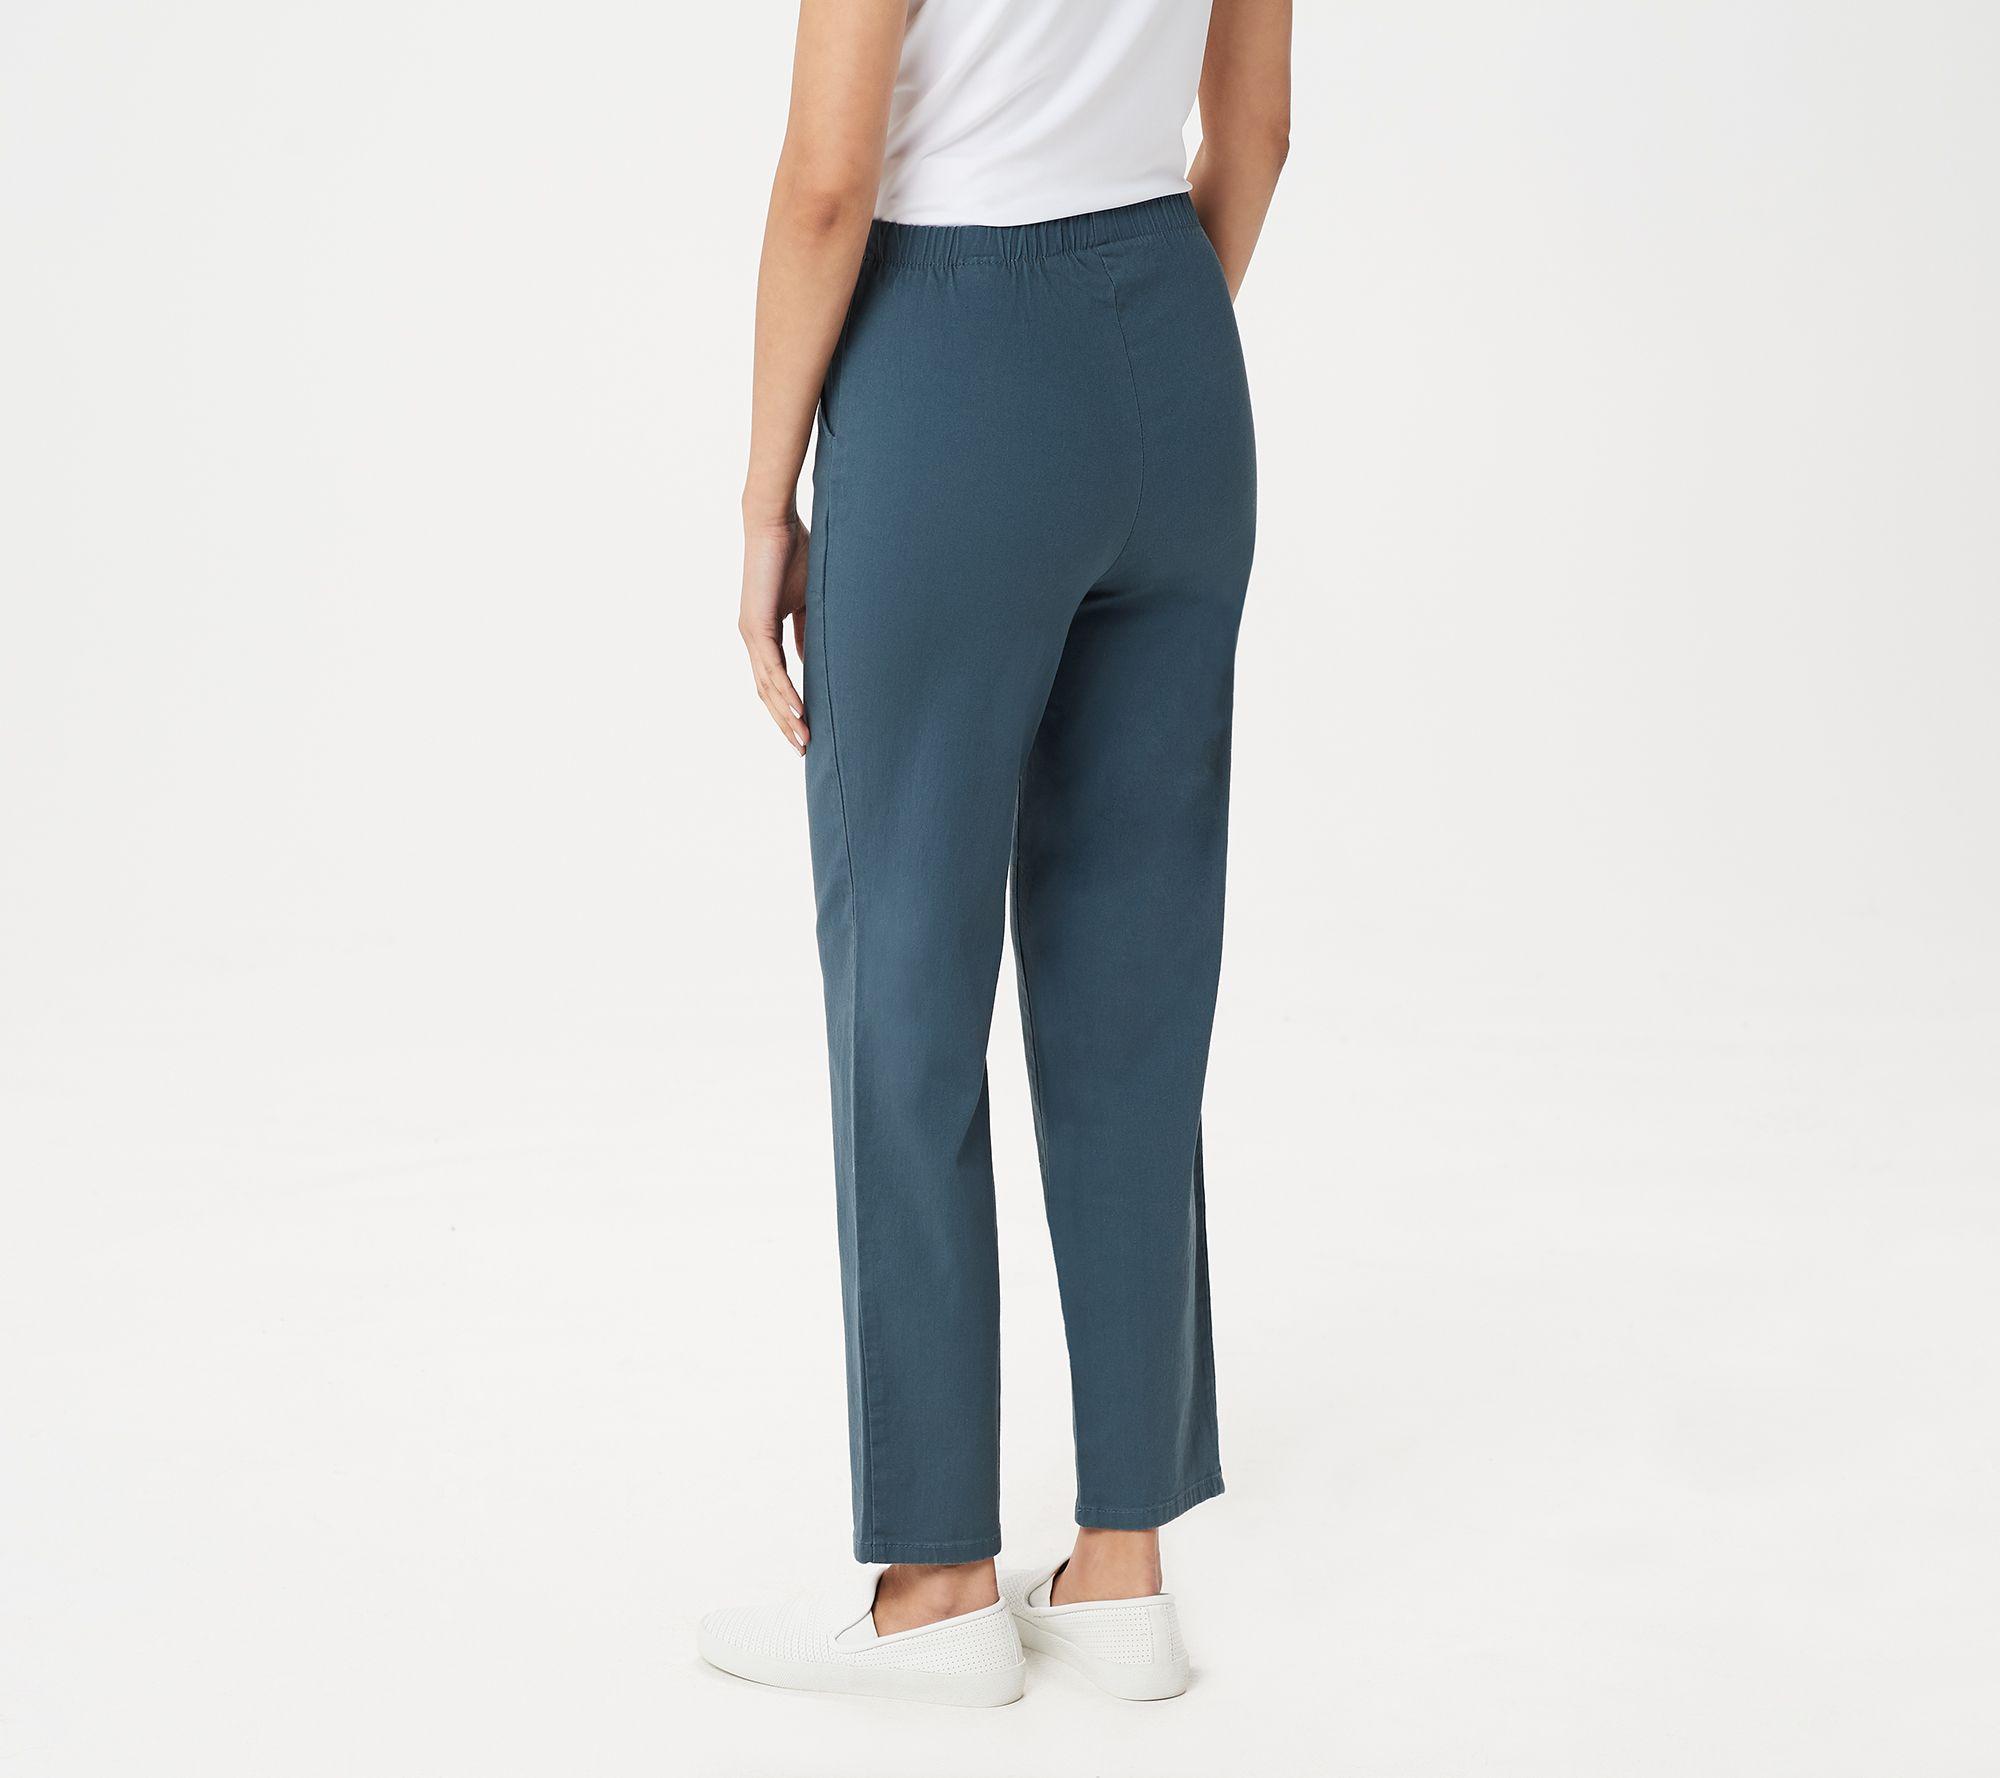 b4f59d4f51 Original Waist Stretch Petite Pants with Side Pockets - Page 1 — QVC.com